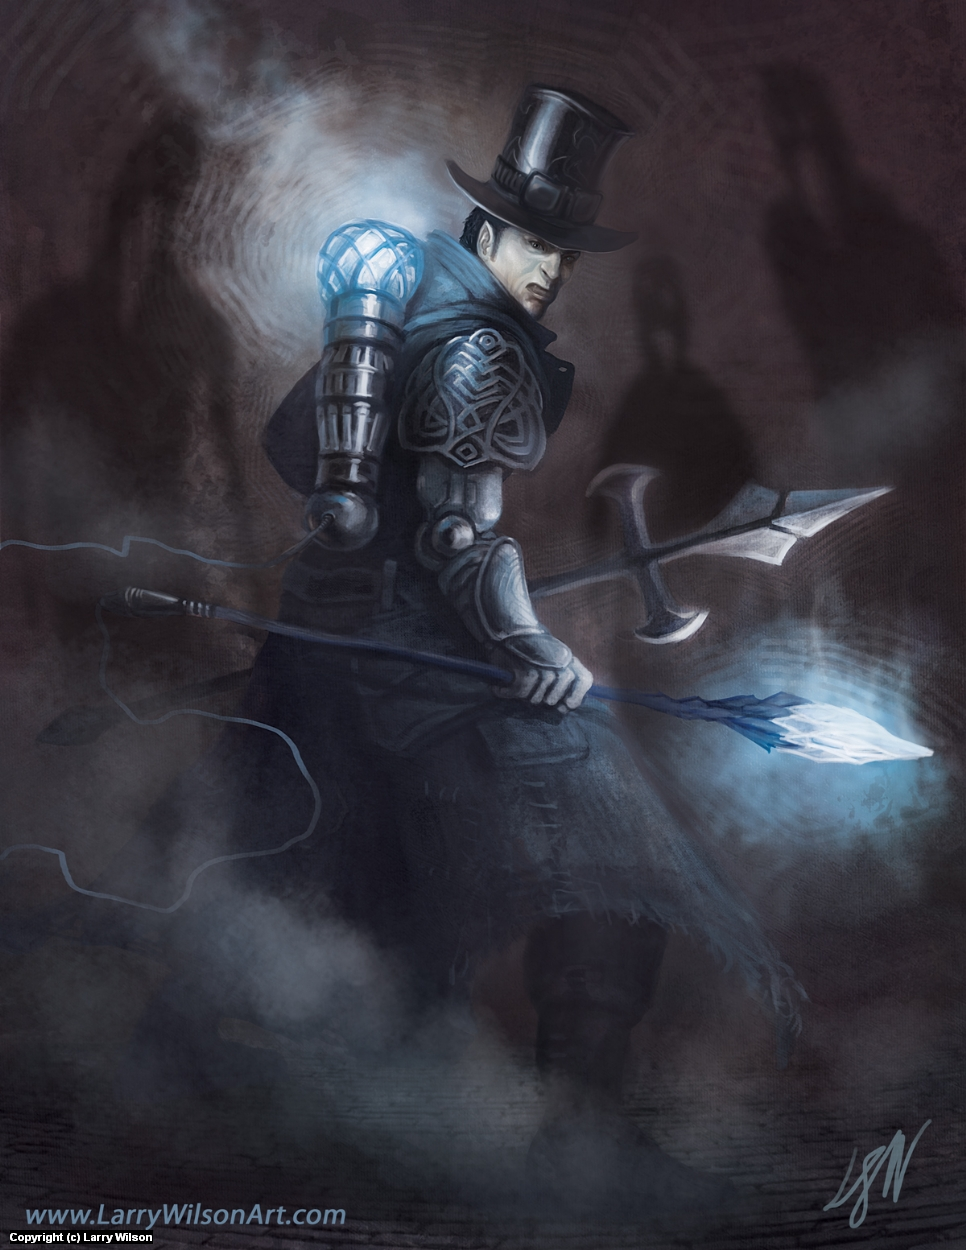 SteamPunk Vampire Hunter Artwork by Larry wilson